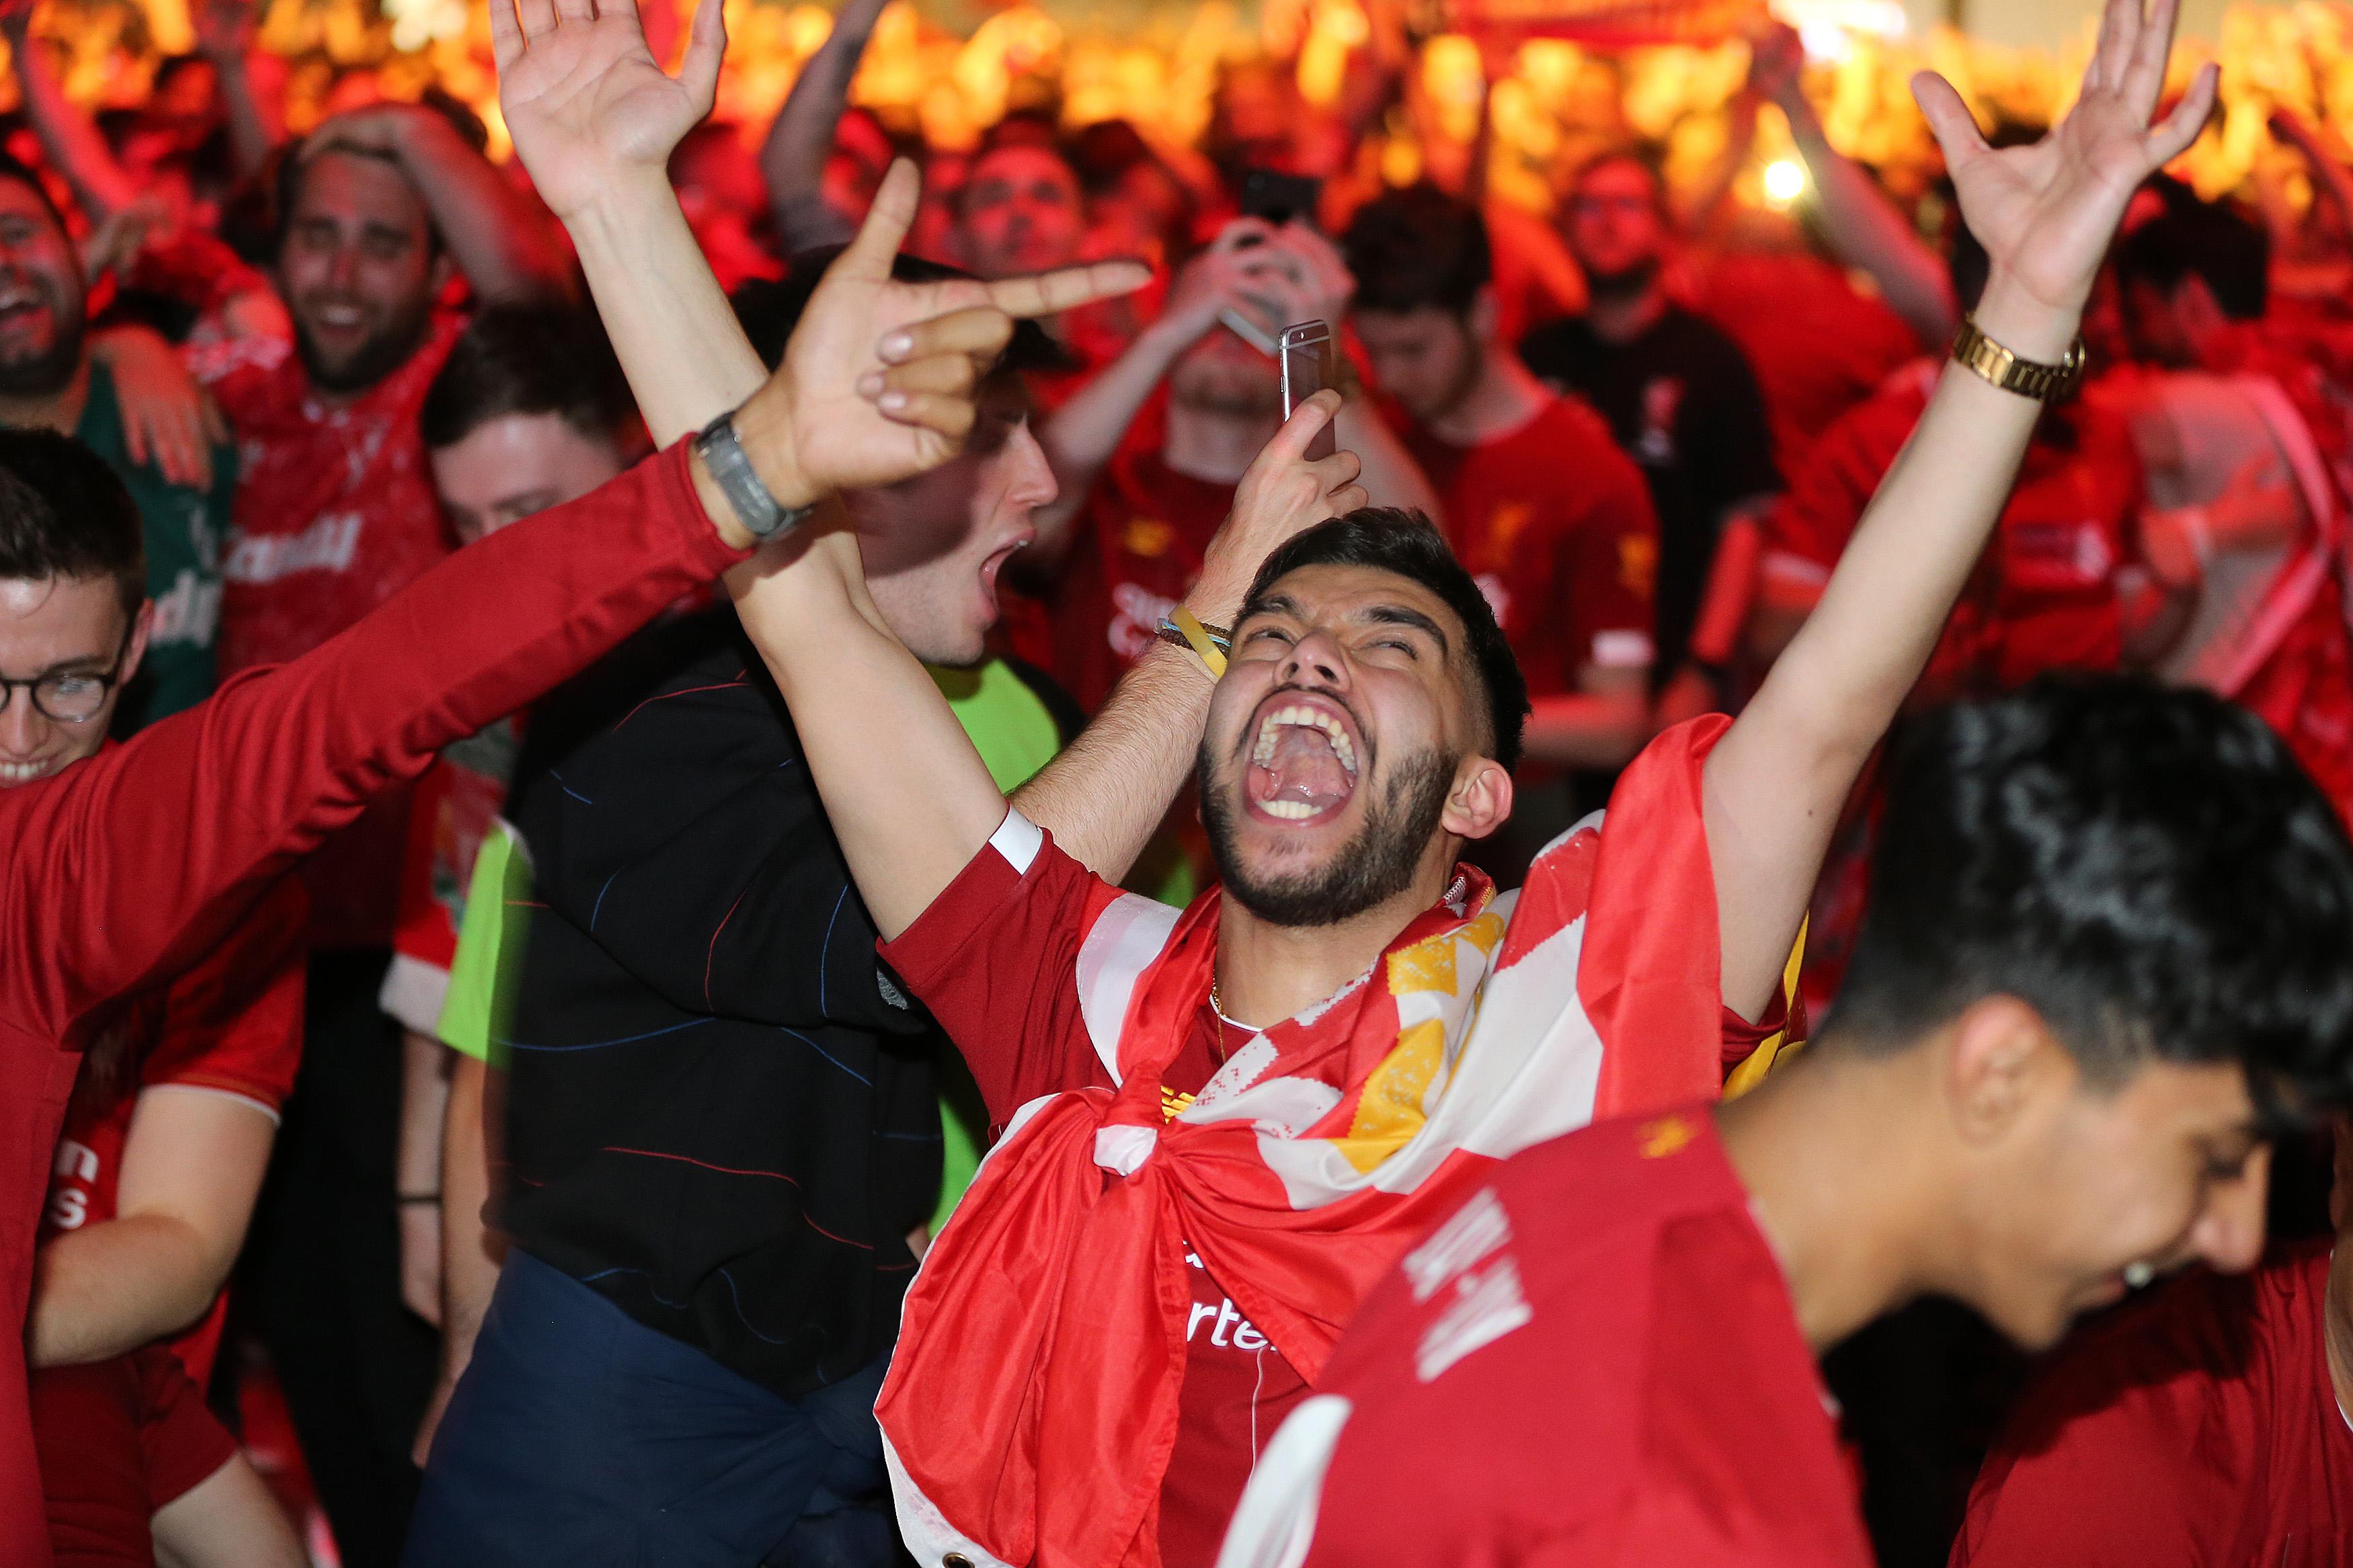 Fans Watch UEFA Champions League Final In Liverpool